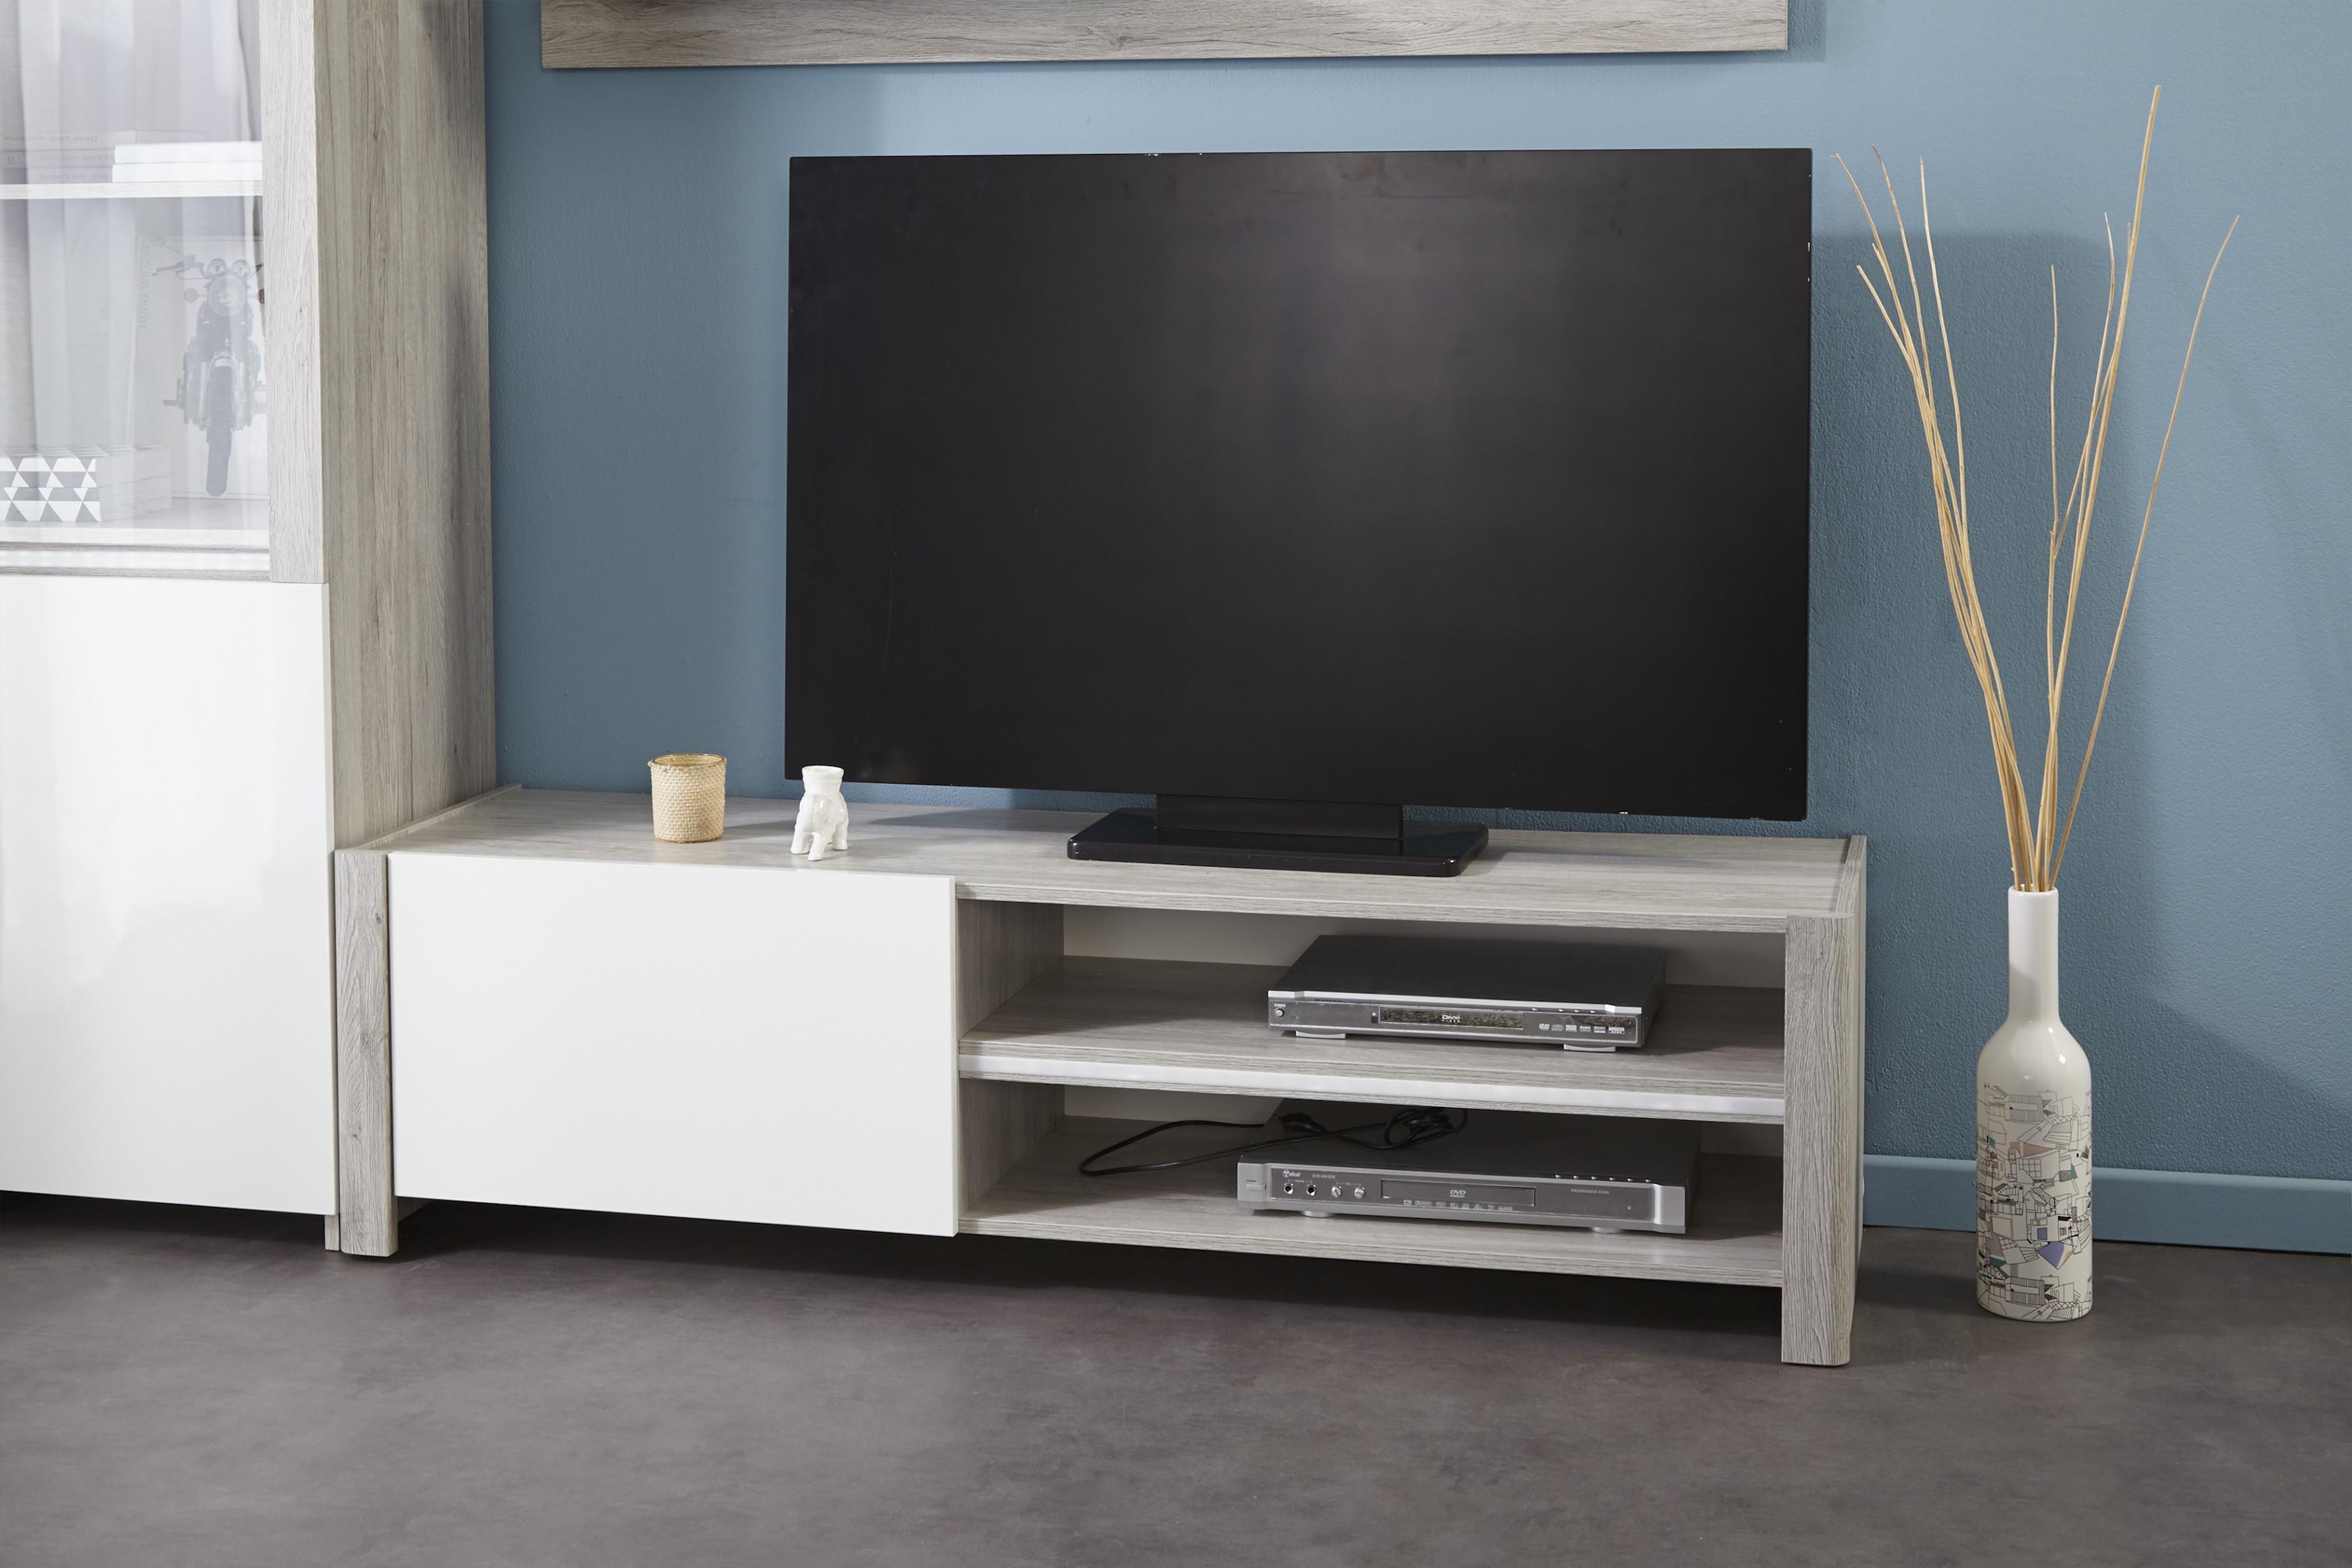 Meuble Tv V Nusia Gris Portofino Et Blanc Brillant Prix Discount # Meuble Tv Gris Blanc